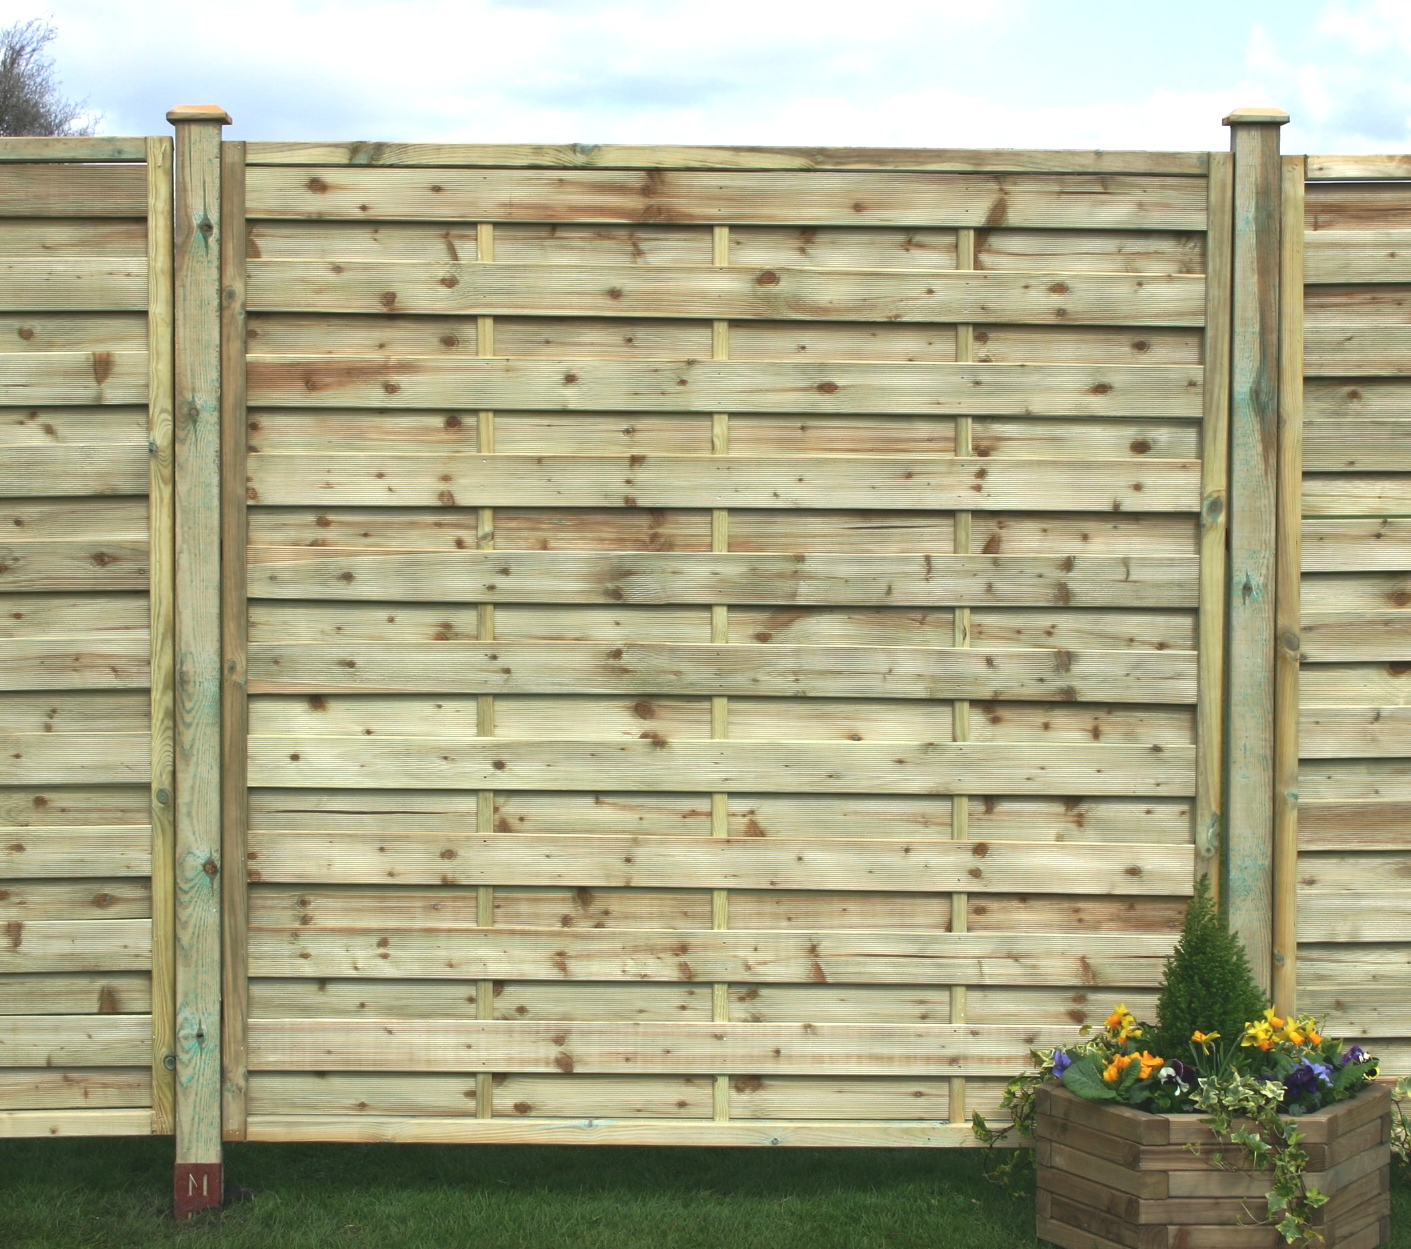 Fencing Panels Fencing Supplies Garden Decking Amp Sheds